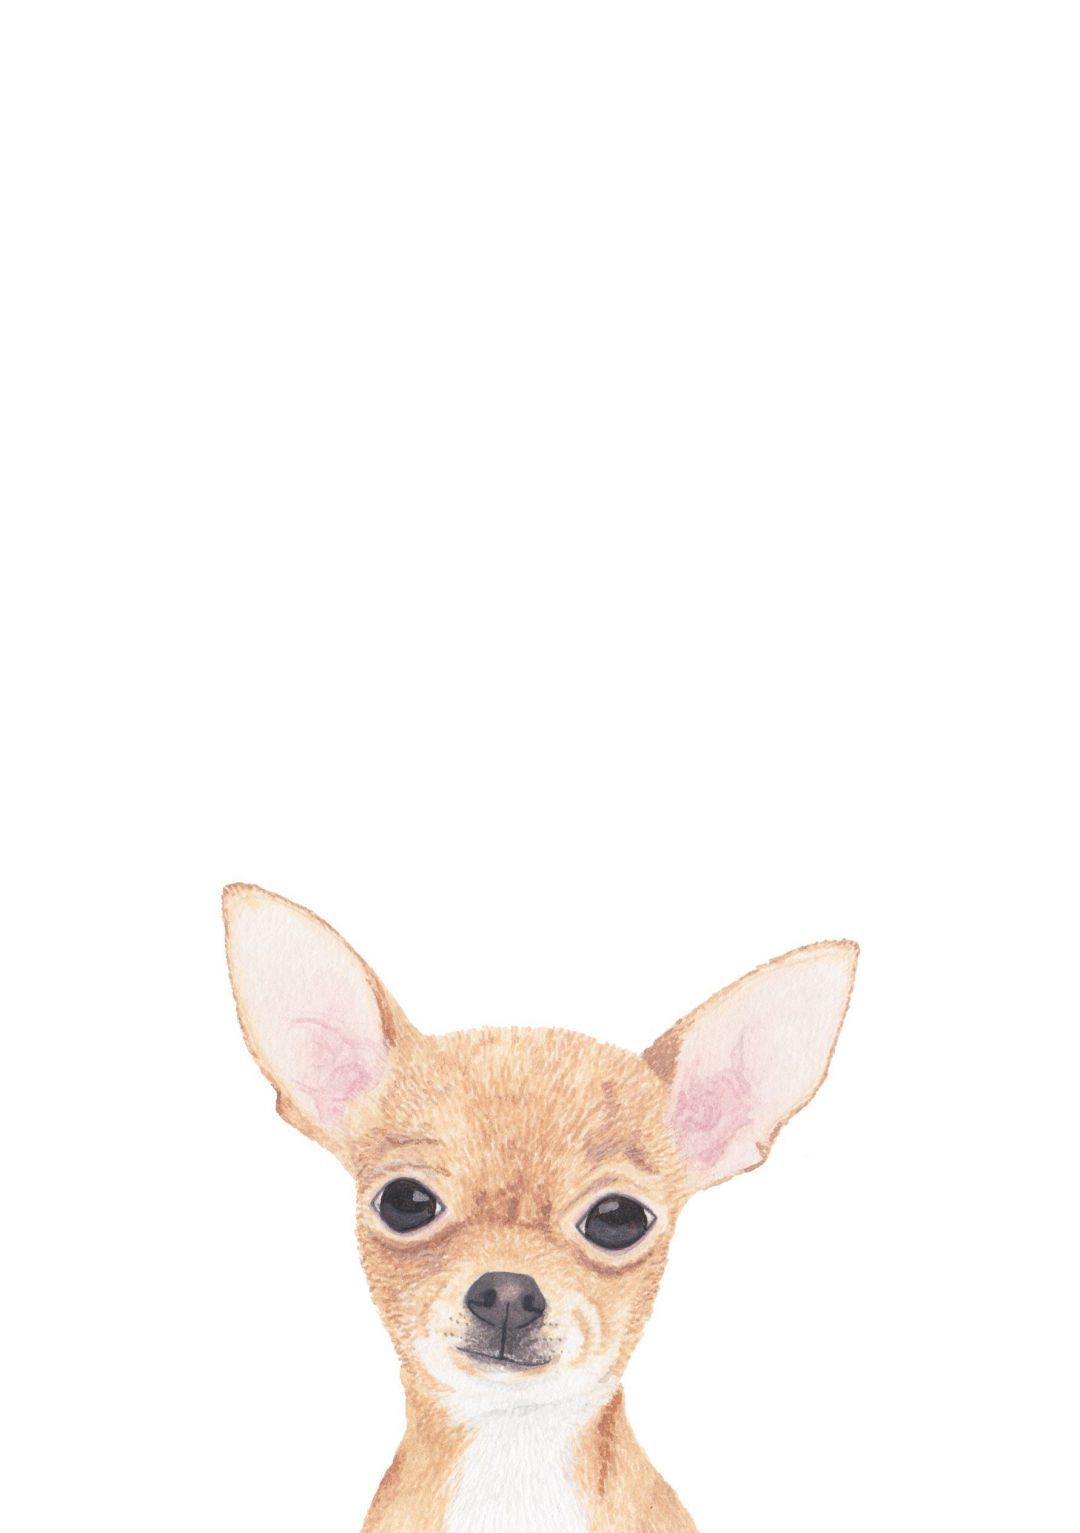 Chihuahua Android Iphone Desktop Hd Backgrounds Wallpapers 1080p 4k 103684 Hdwallpapers Androidw Chihuahua Art Chihuahua Drawing Chihuahua Tattoo